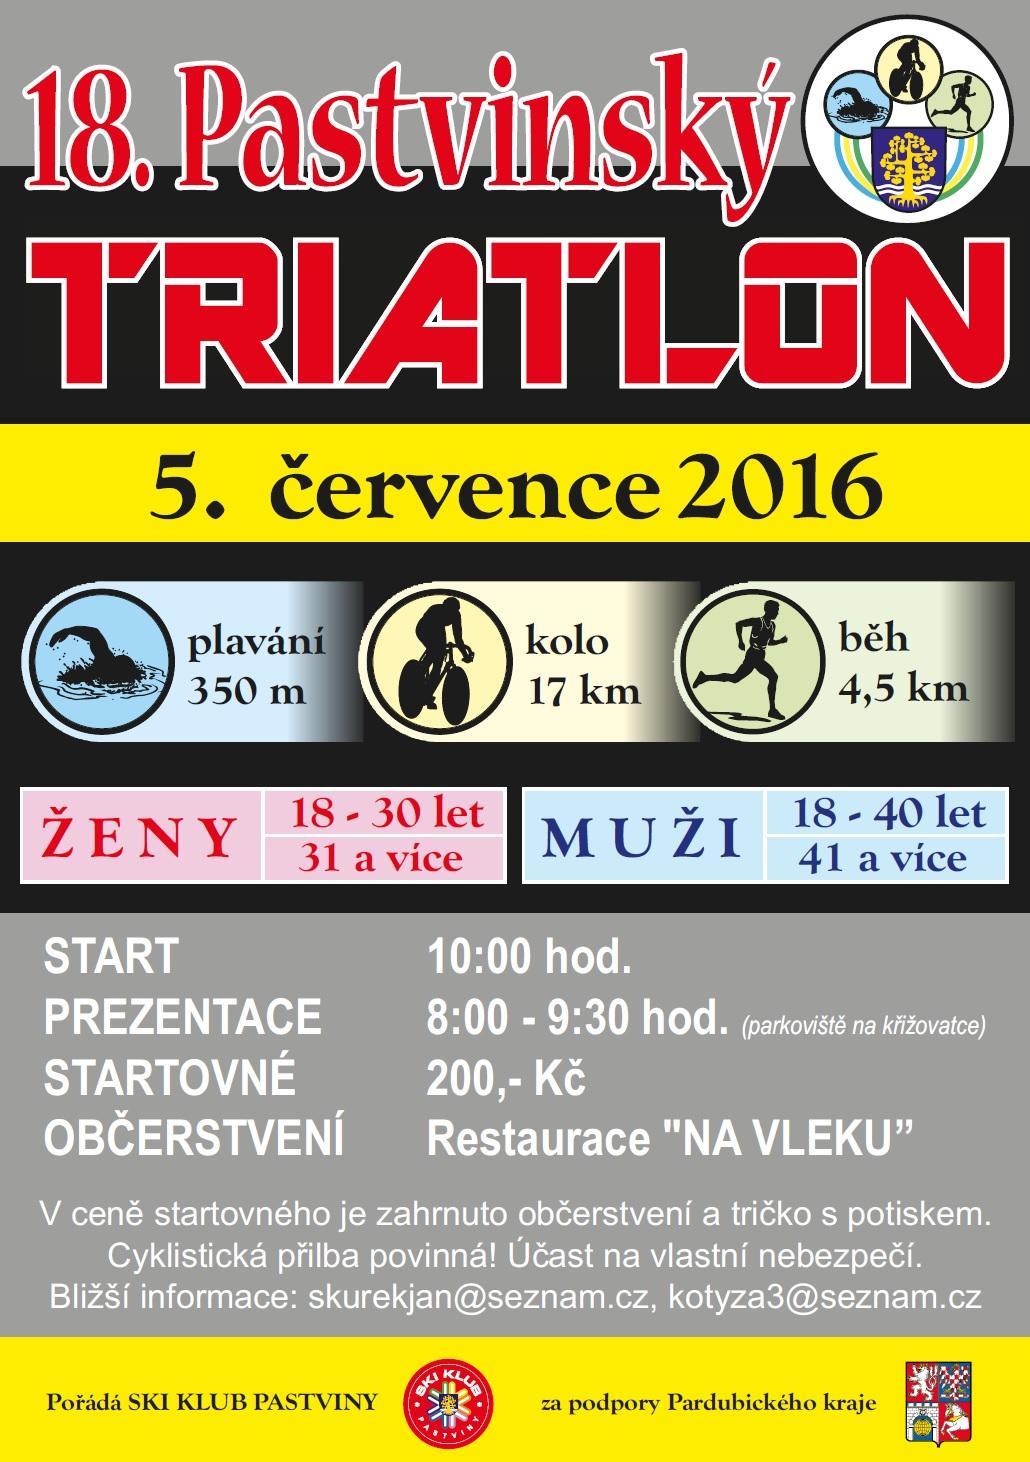 18.Pastvinsky triatlon.jpg